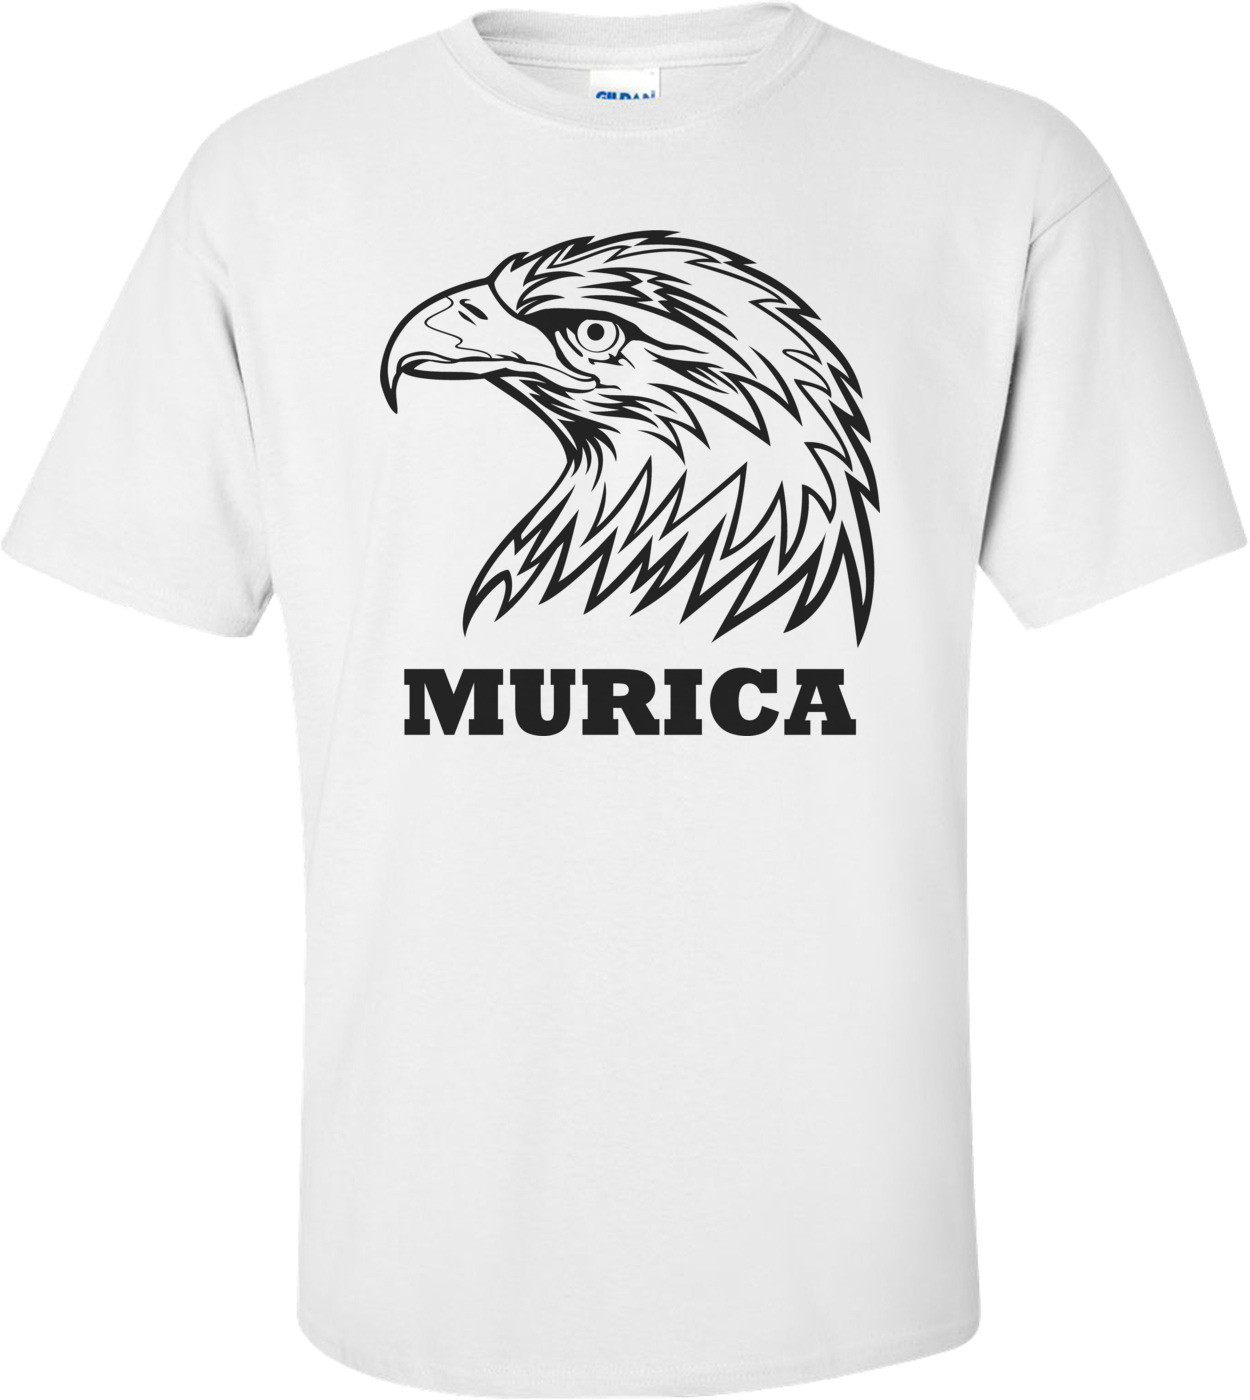 Murica Patriotic T-shirt